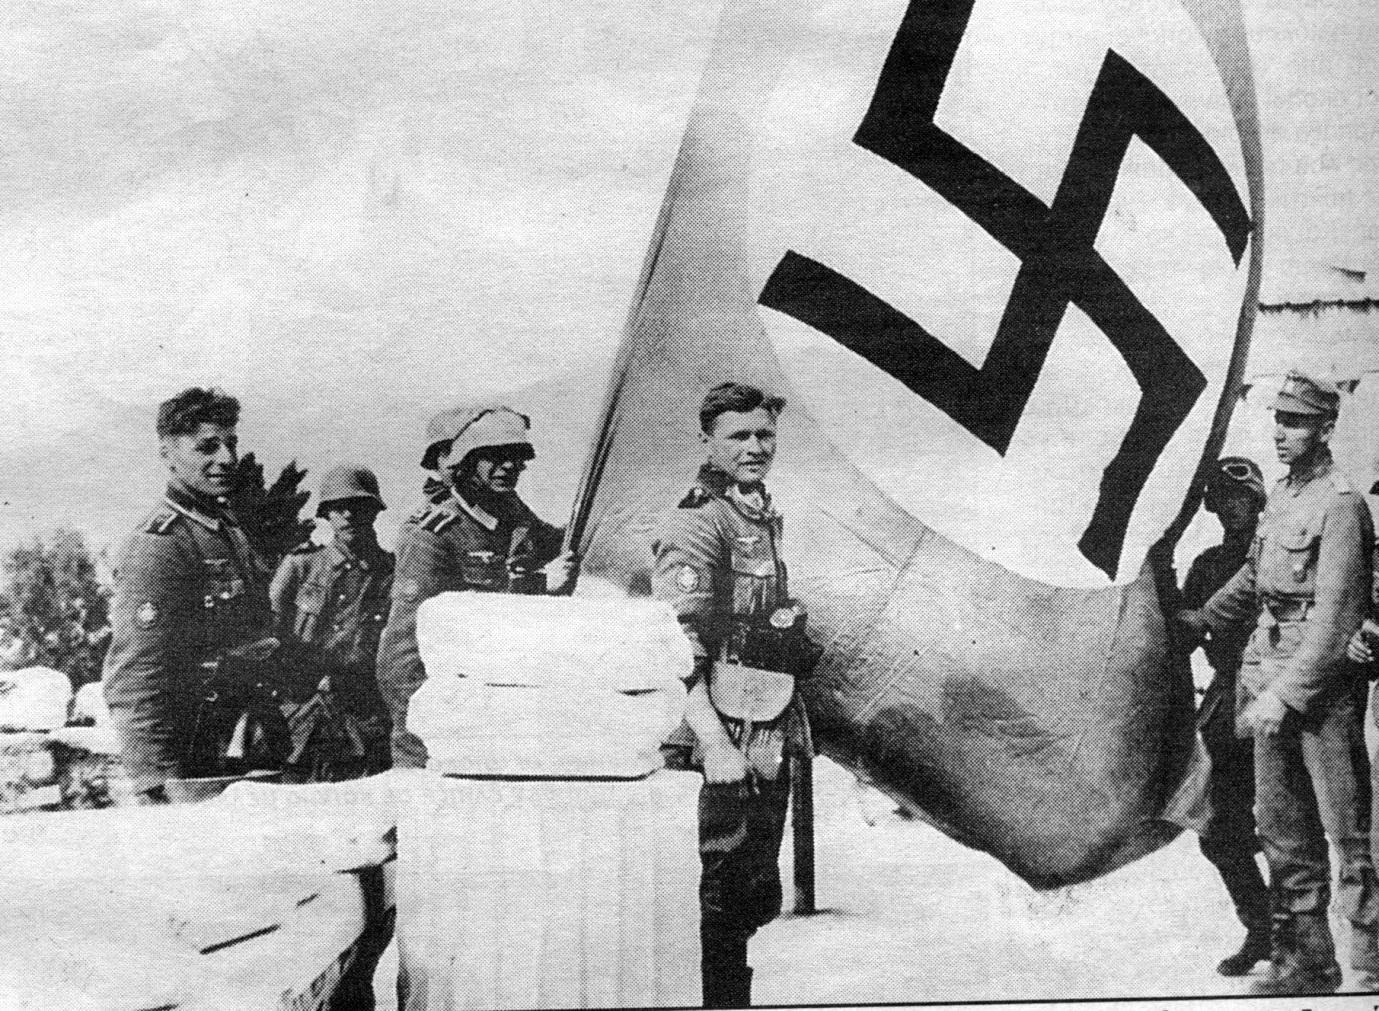 http://users.sch.gr/pchaloul/fasism-katohi-emfyl/flag-nazi-Akrop.jpg